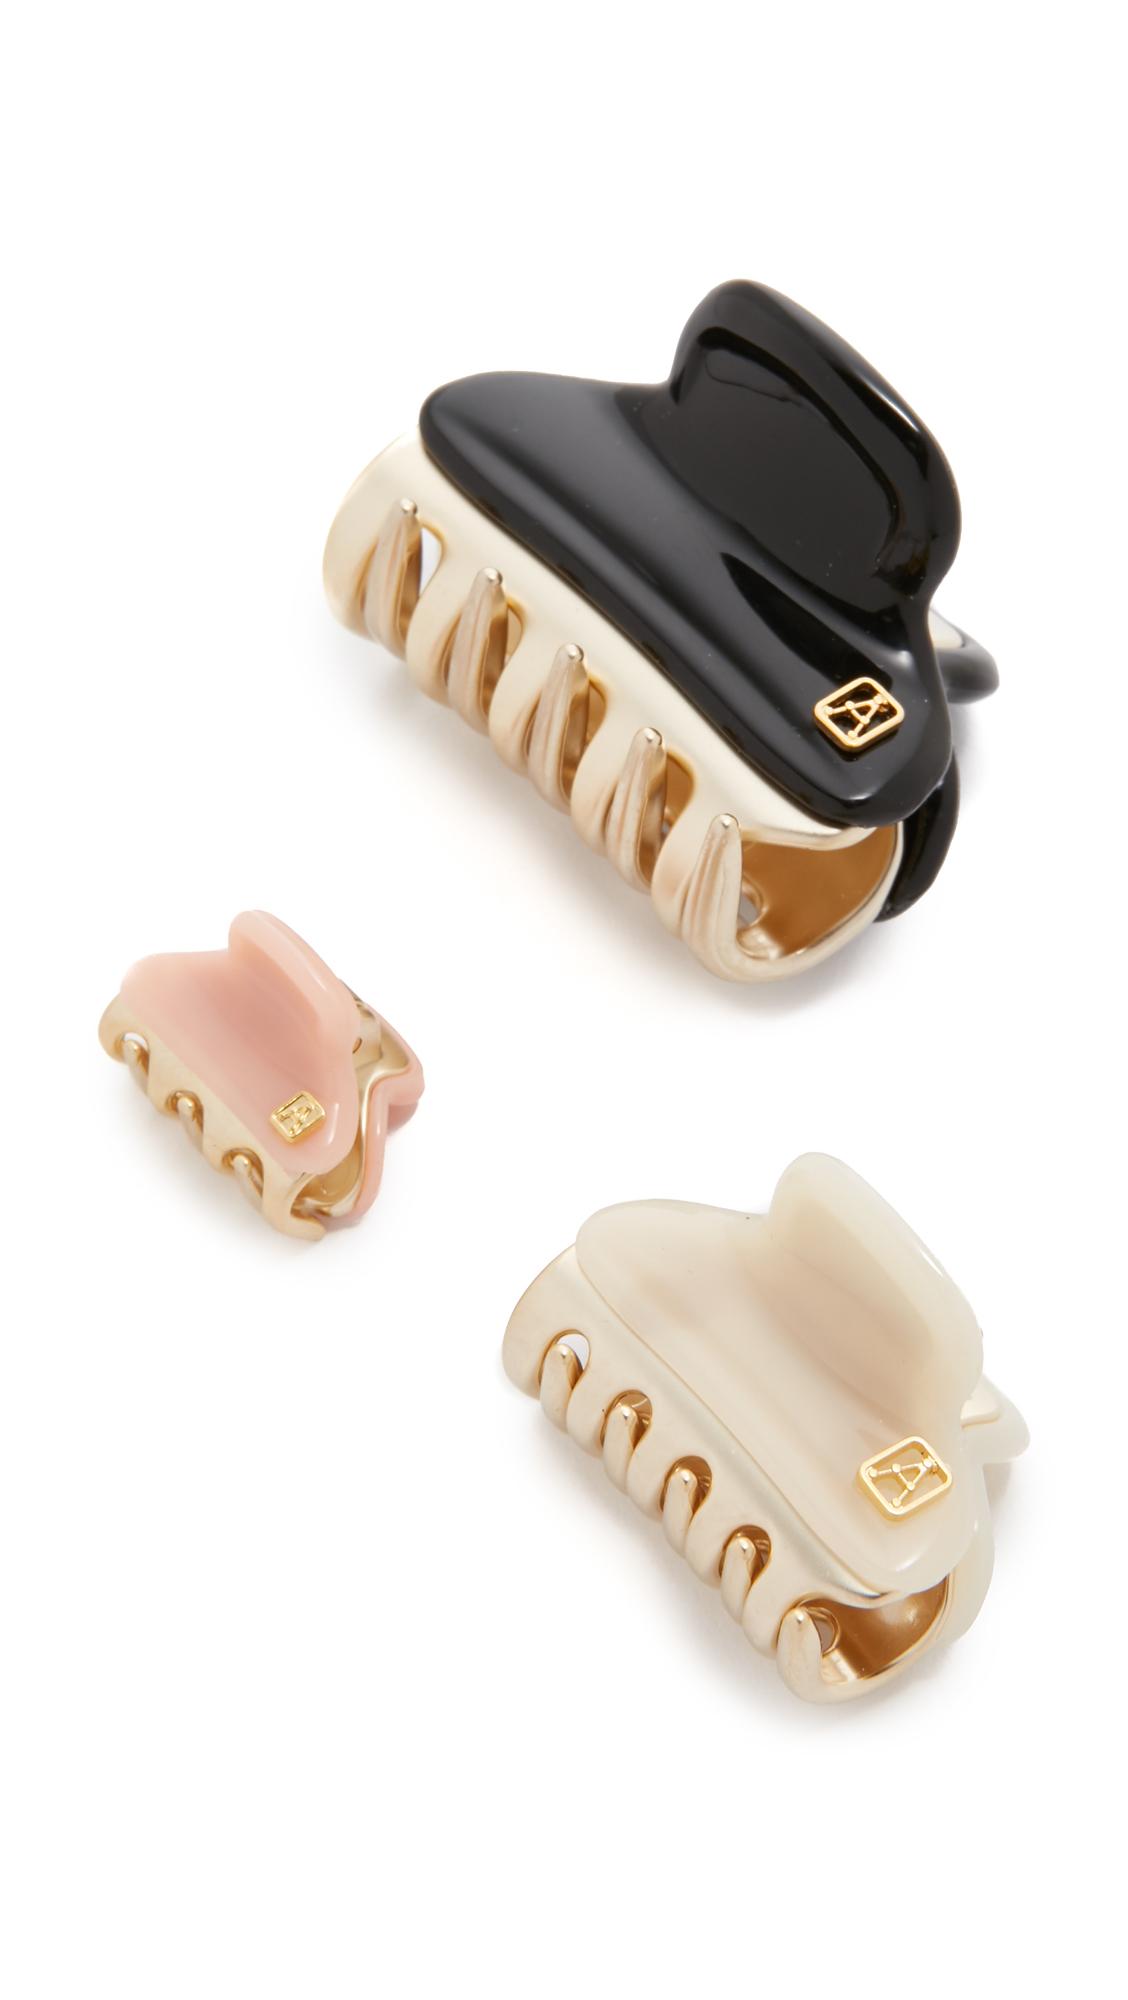 Alexandre De Paris Set Of 3 Hair Clips - Cream/Rose/Black at Shopbop